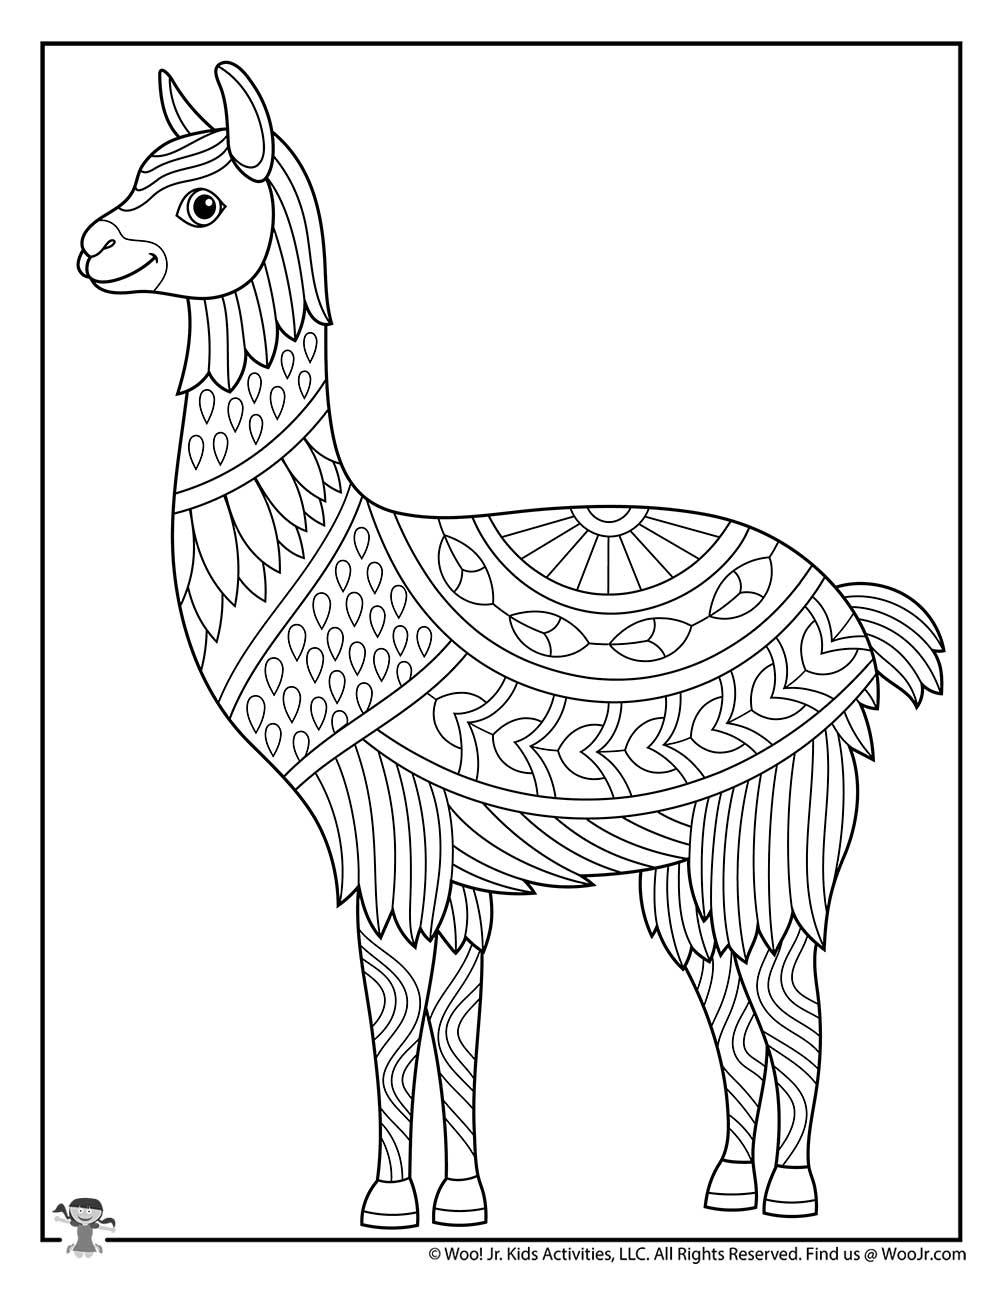 Llama Easy Adult Coloring Animals   Woo! Jr. Kids Activities